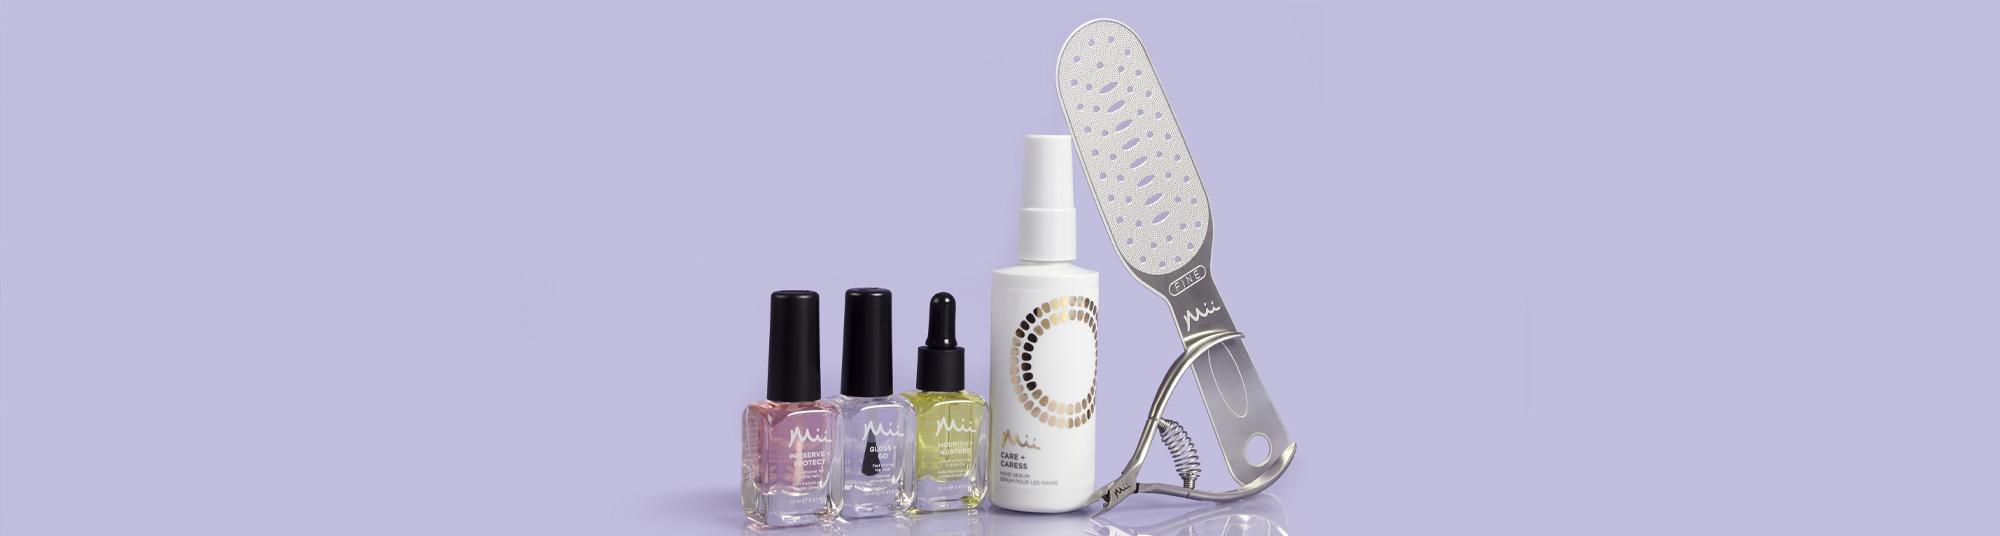 Mii Hand, Nail & Foot Care Category